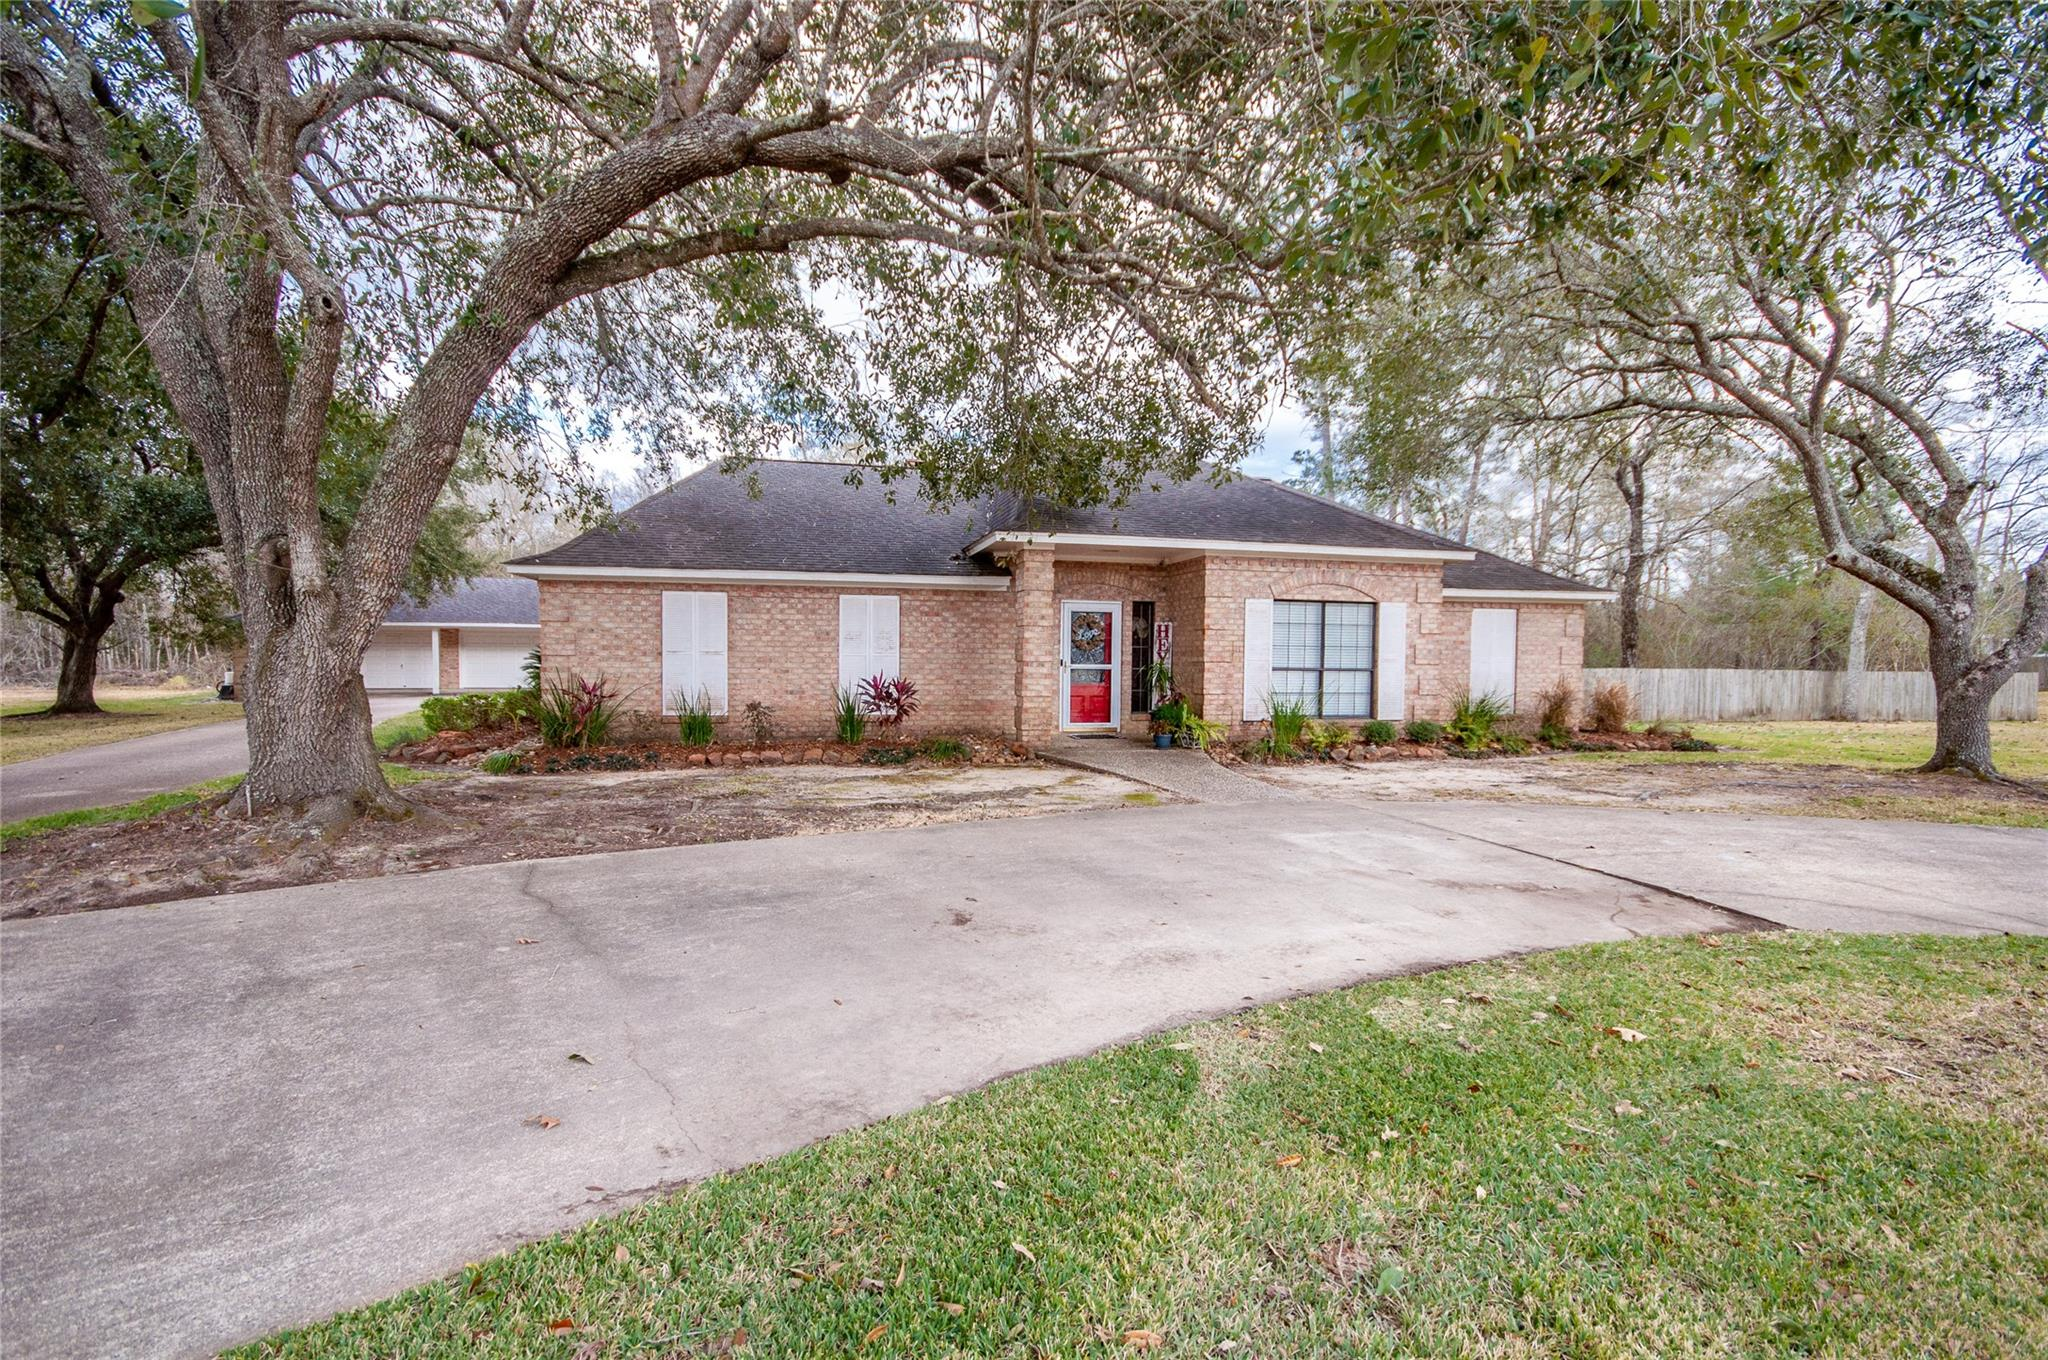 102 Mockingbird Lane Property Photo - Liberty, TX real estate listing